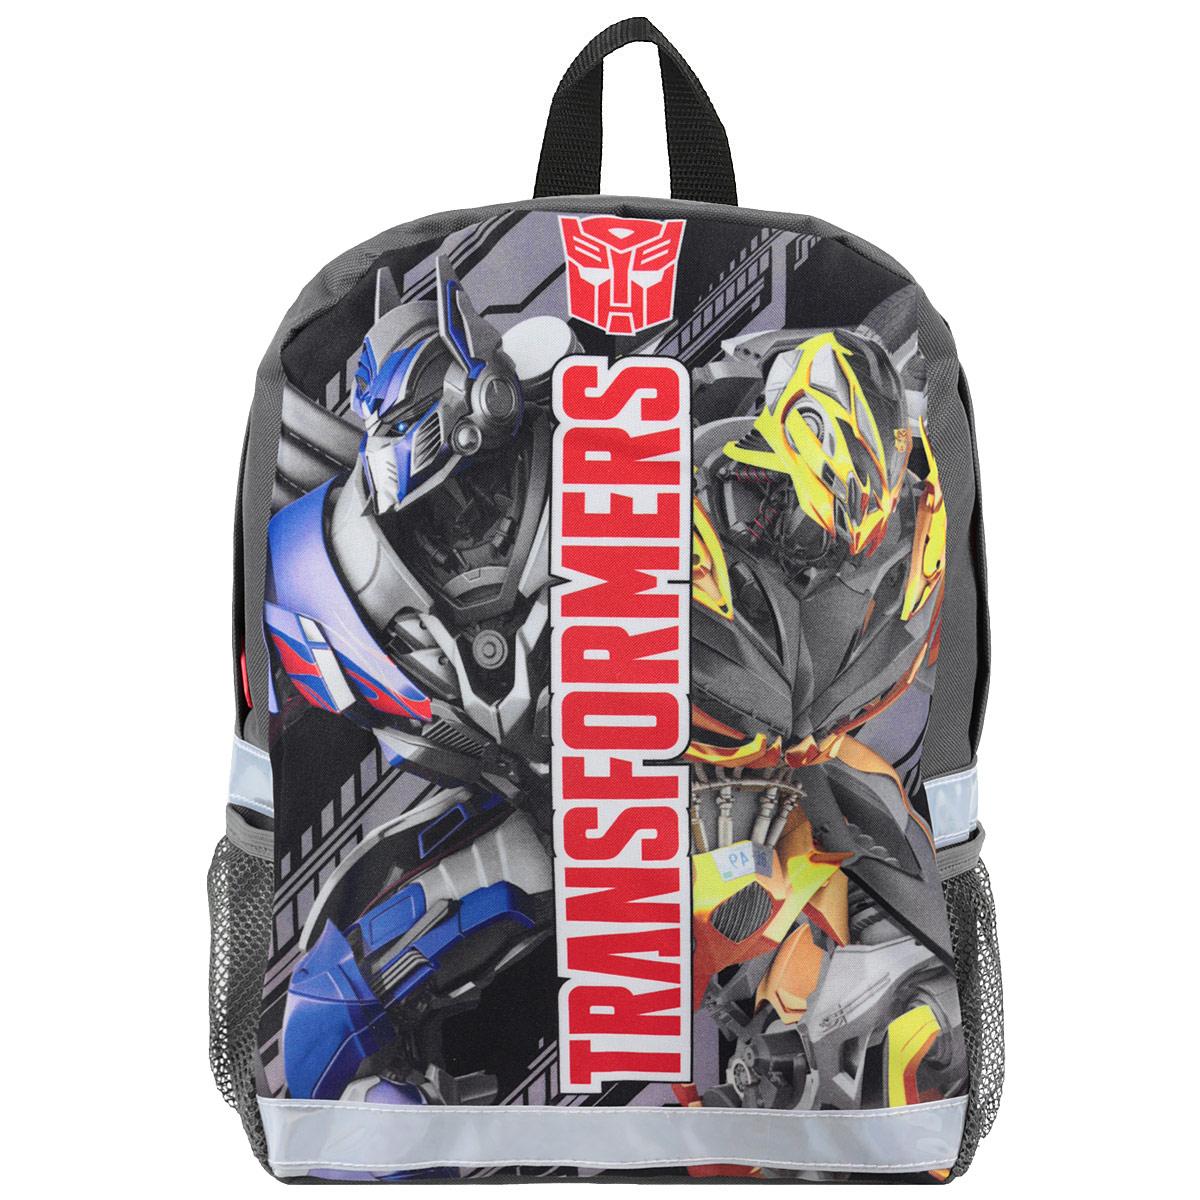 "������ ������� ""Transformers Prime"", ����: �����, ������. TRCB-UT4-566"